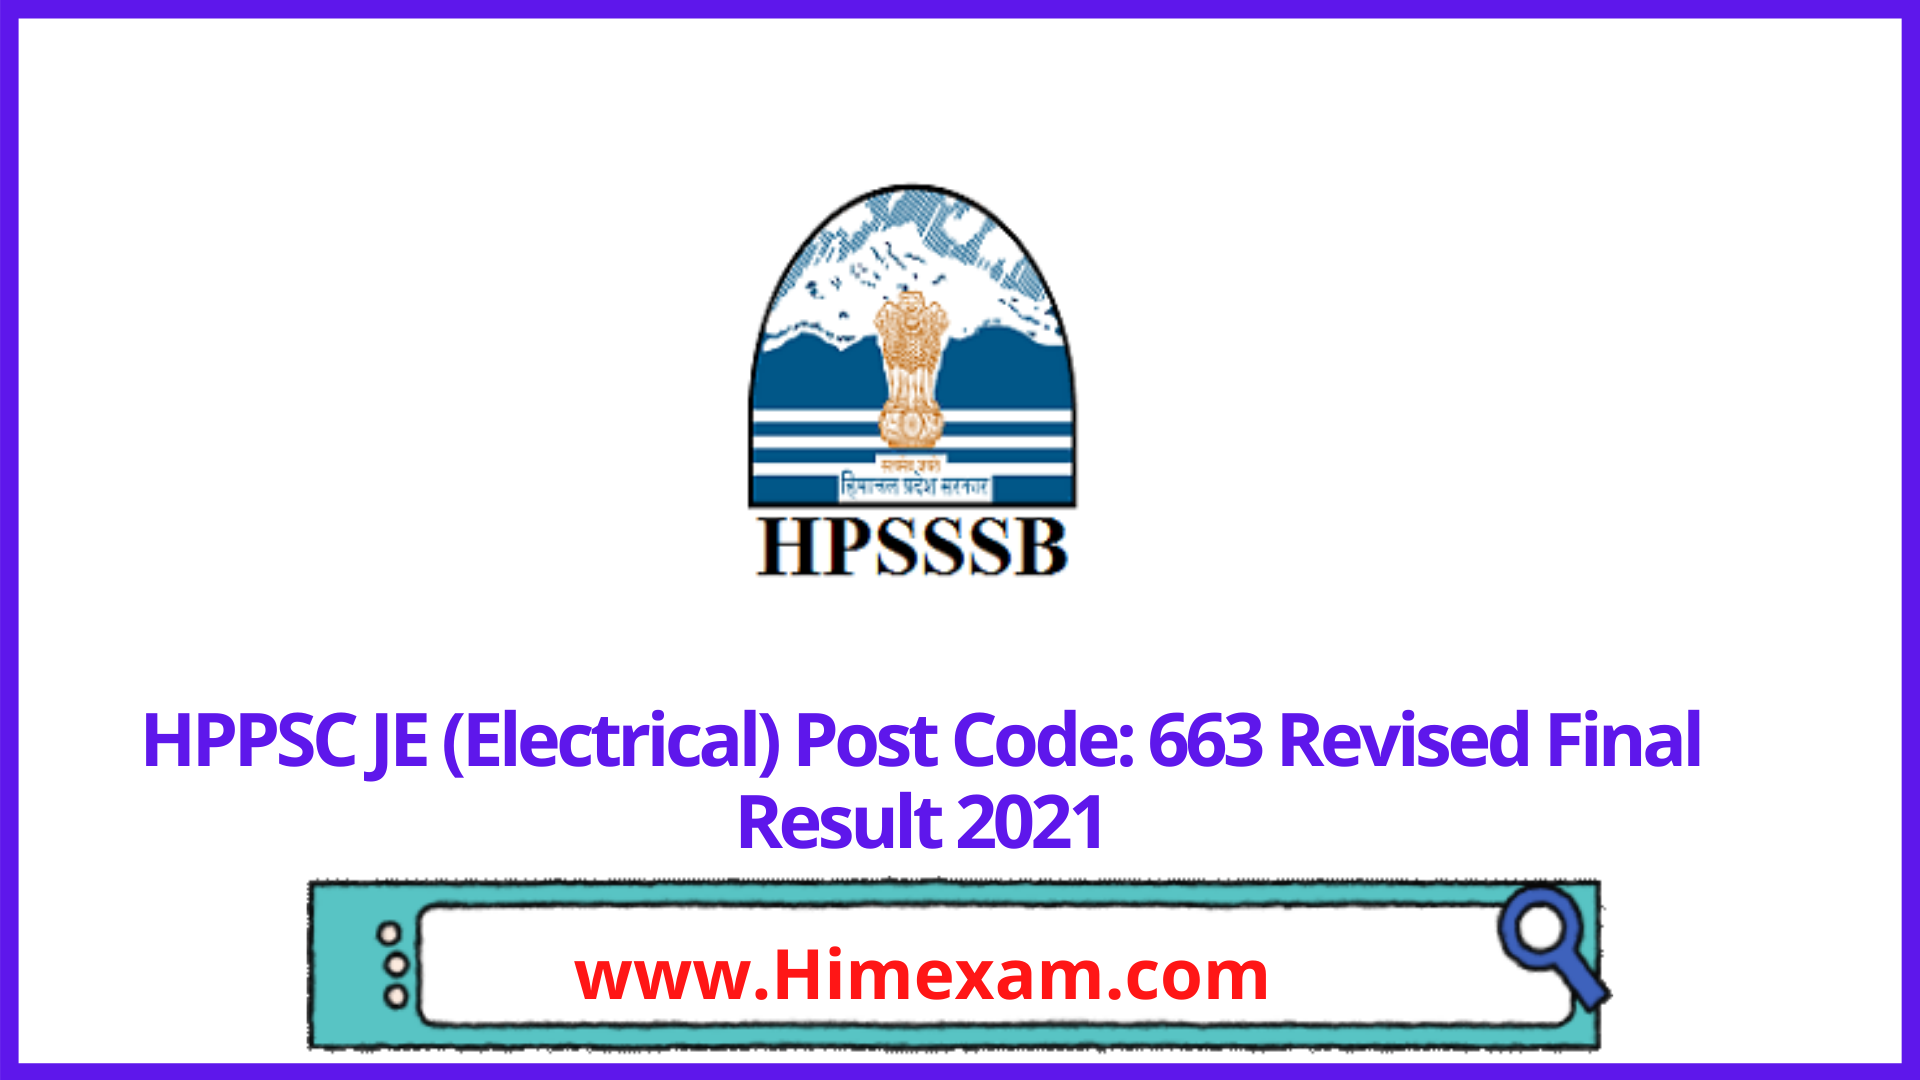 HPPSC JE (Electrical) Post Code: 663 Revised Final Result 2021